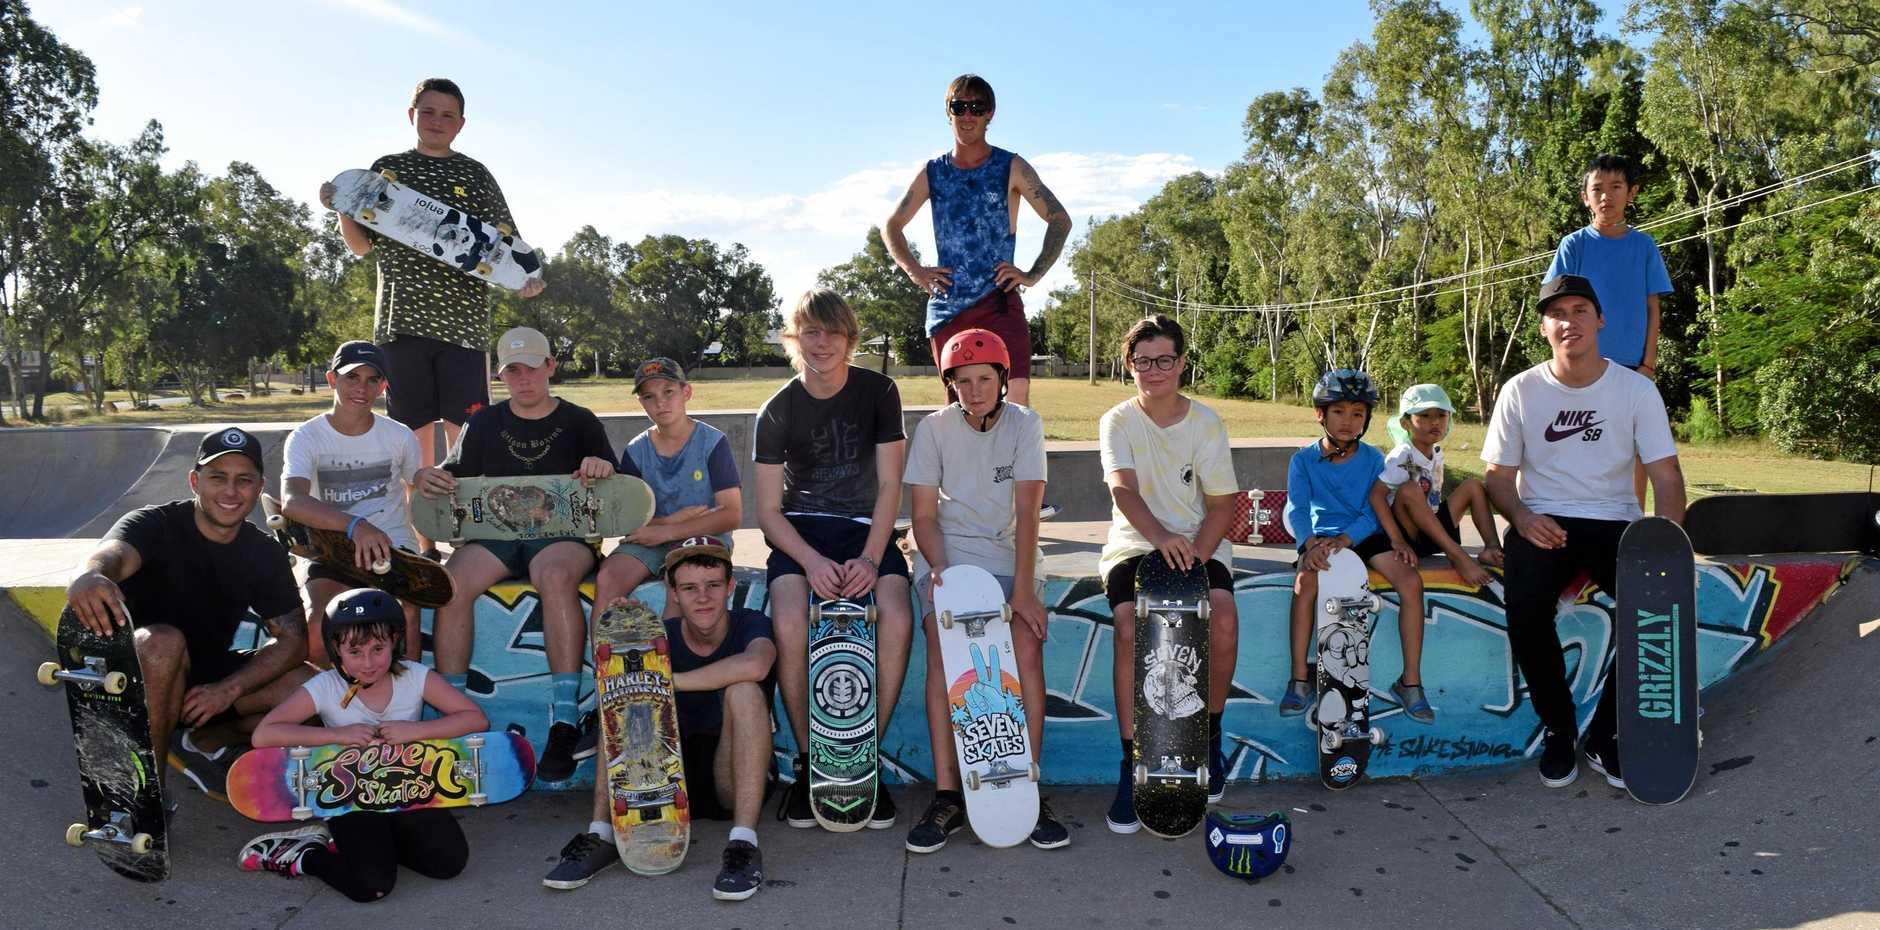 FUN TIMES: Emerald Skate Mates supplies free skateboard coaching and training at Emerald Skatepark.